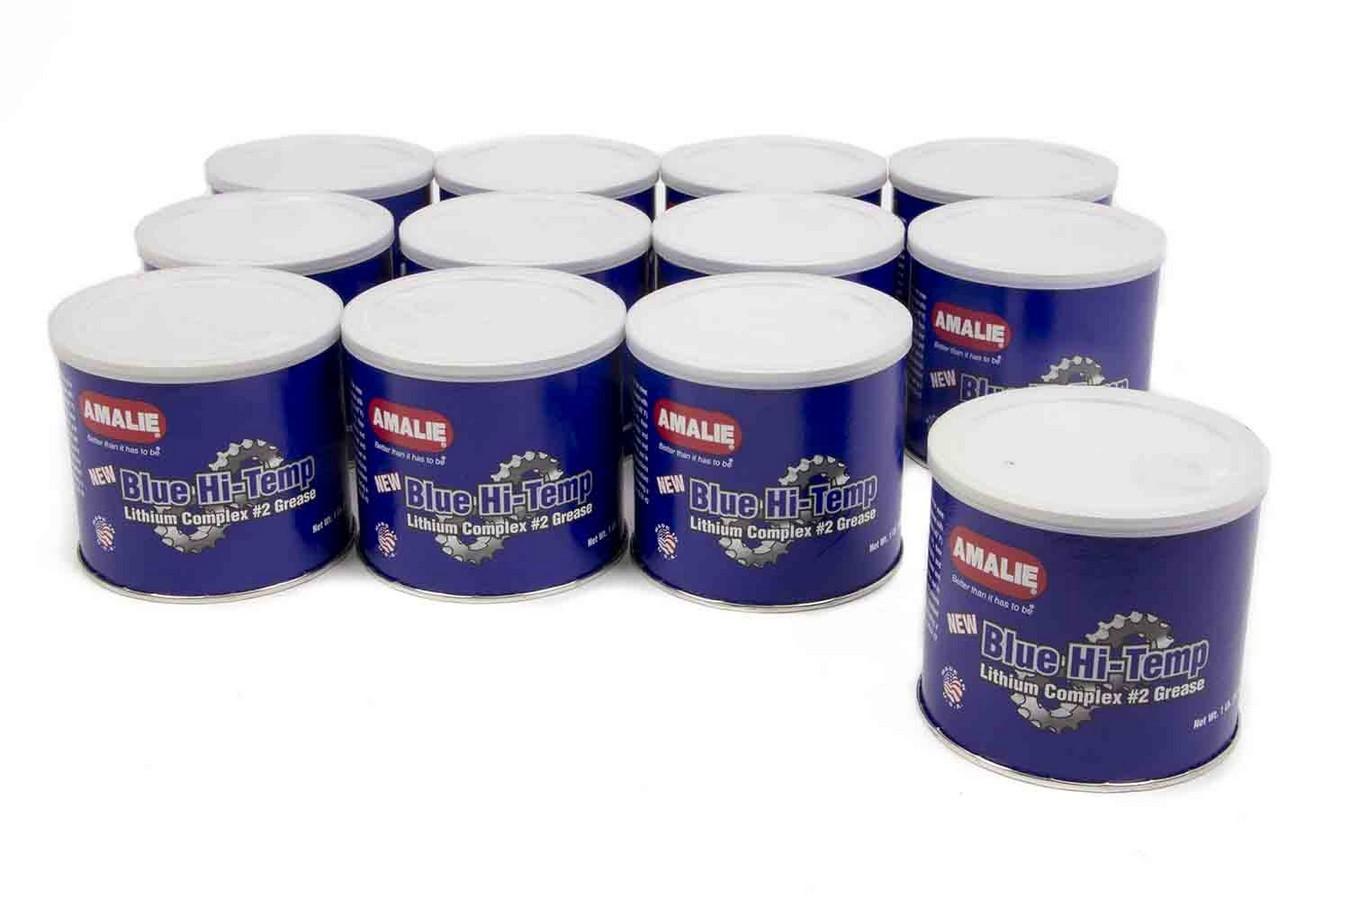 Amalie 160-68326-93 Grease, Blue Hi-Temp, Conventional, 1 lb Tub, Set of 12